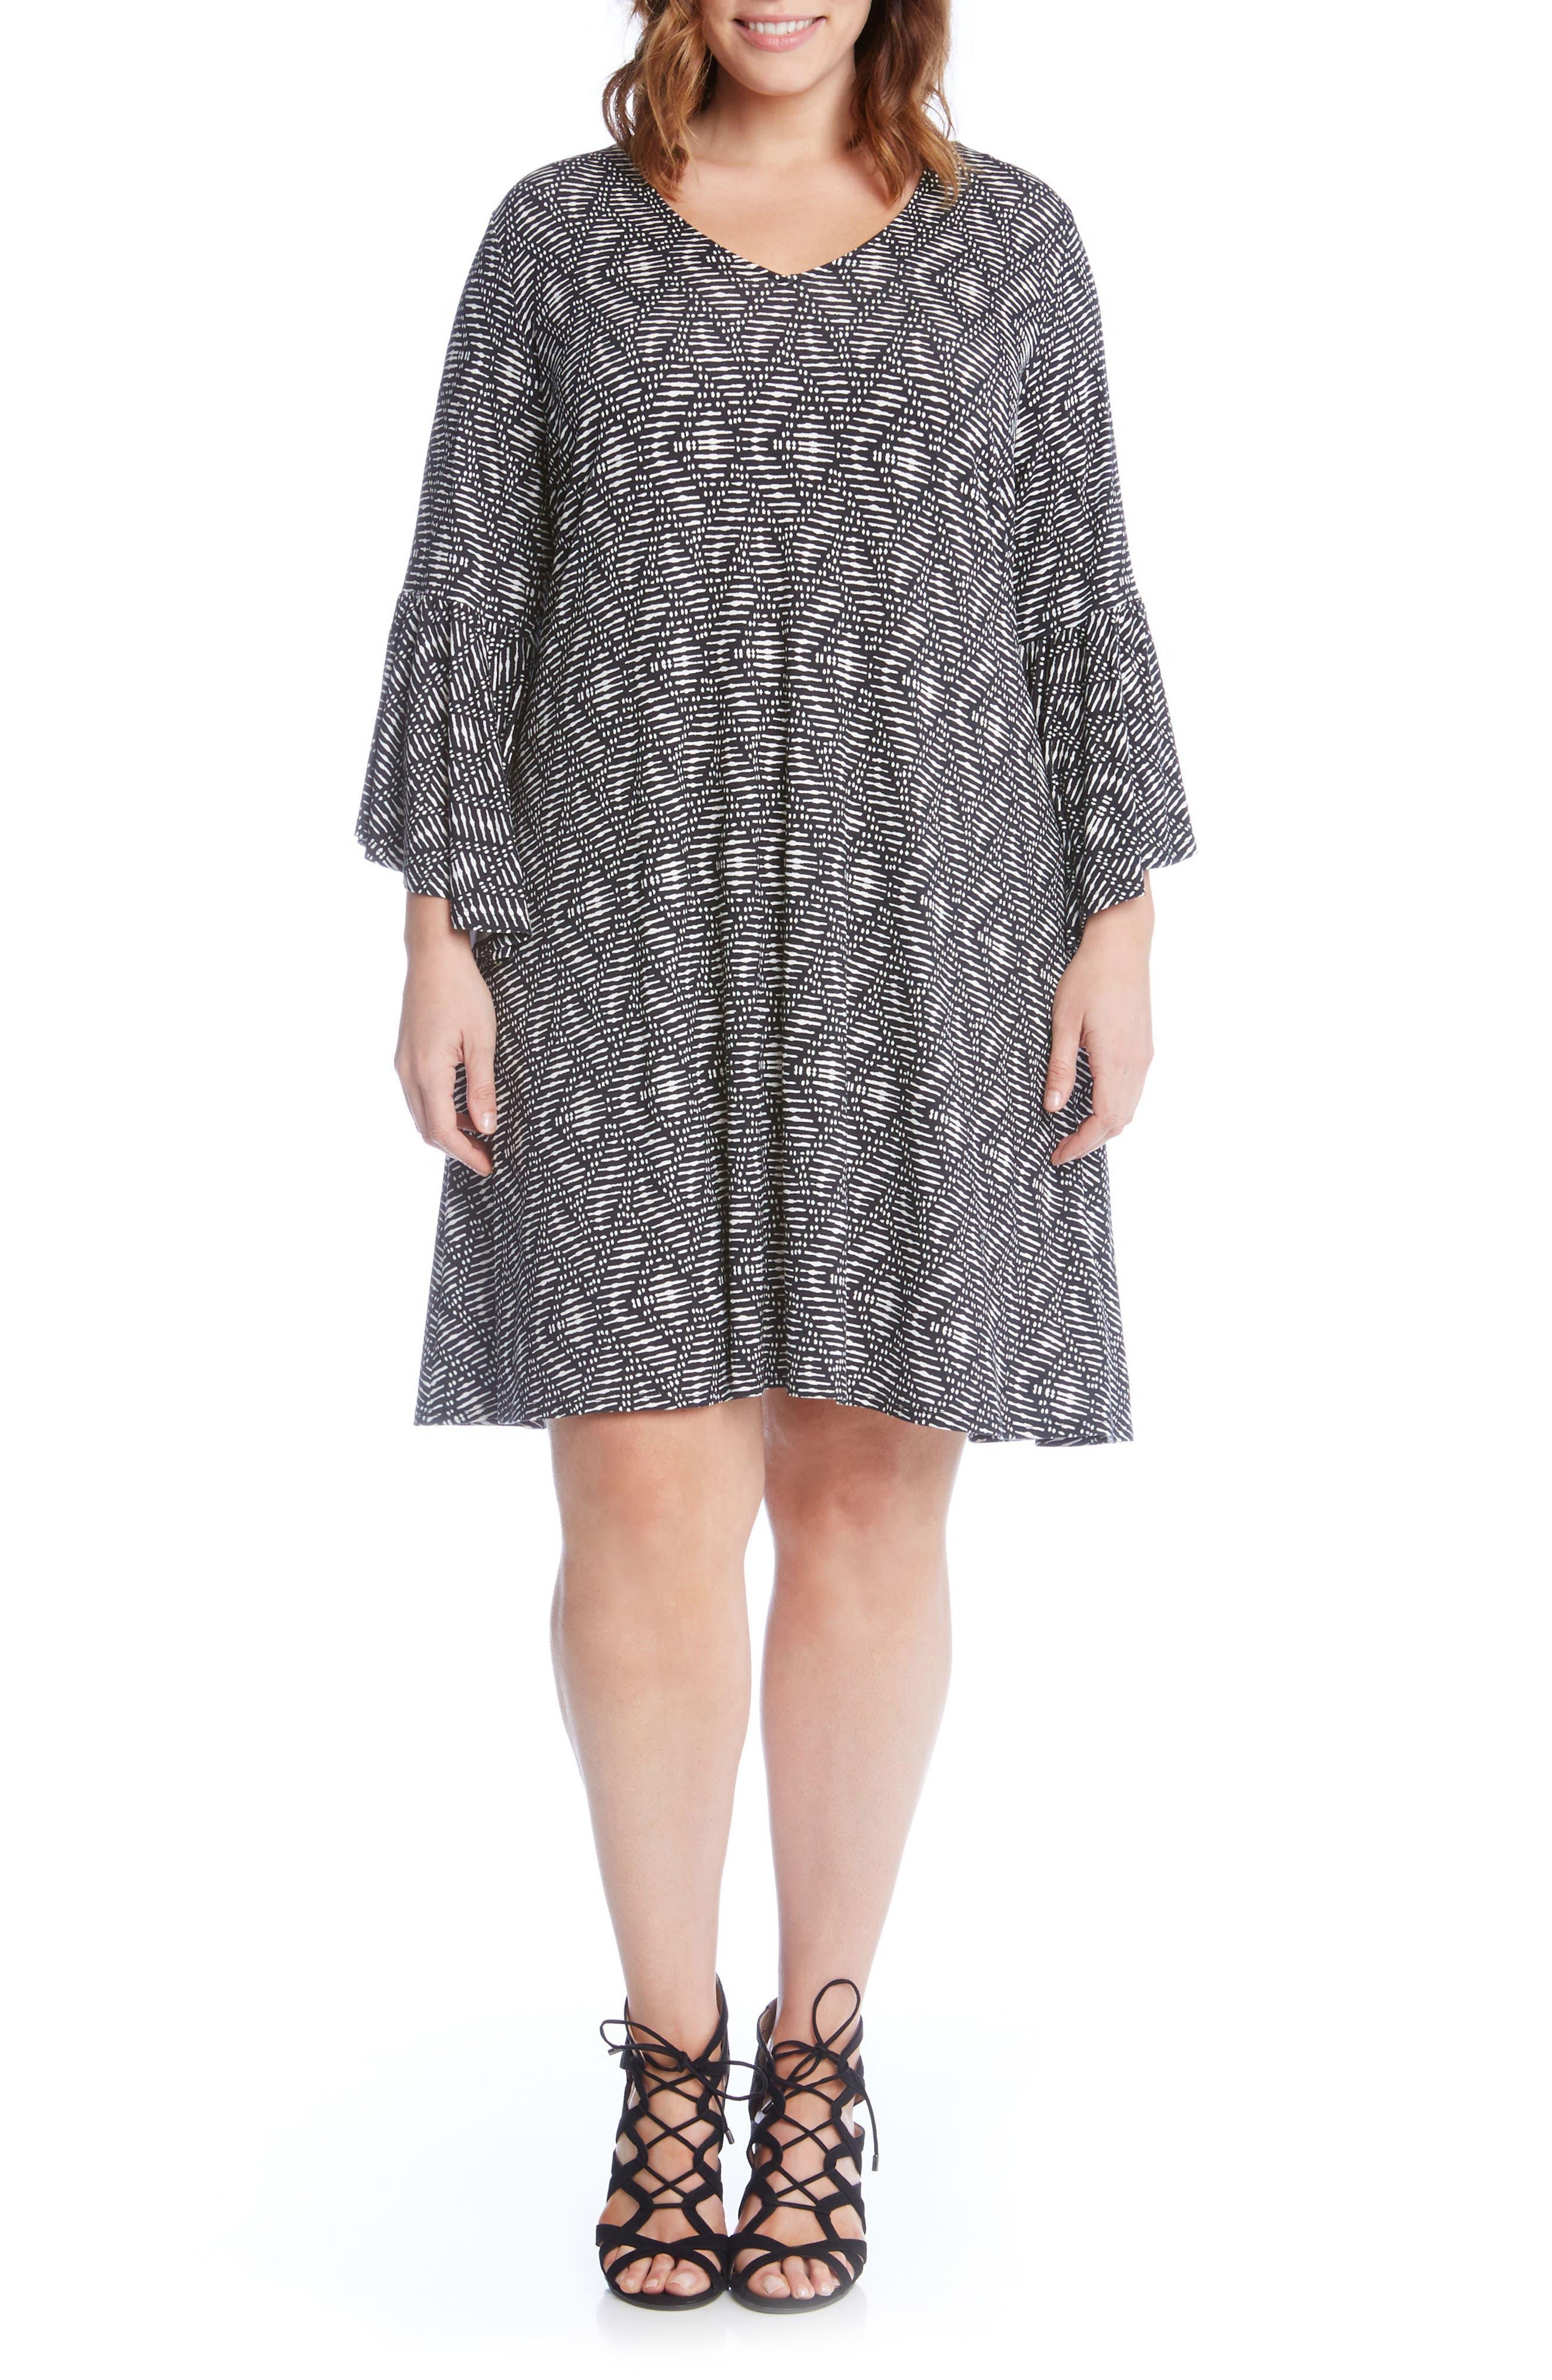 Alternate Image 1 Selected - Karen Kane Bell Sleeve Swing Dress (Plus Size)